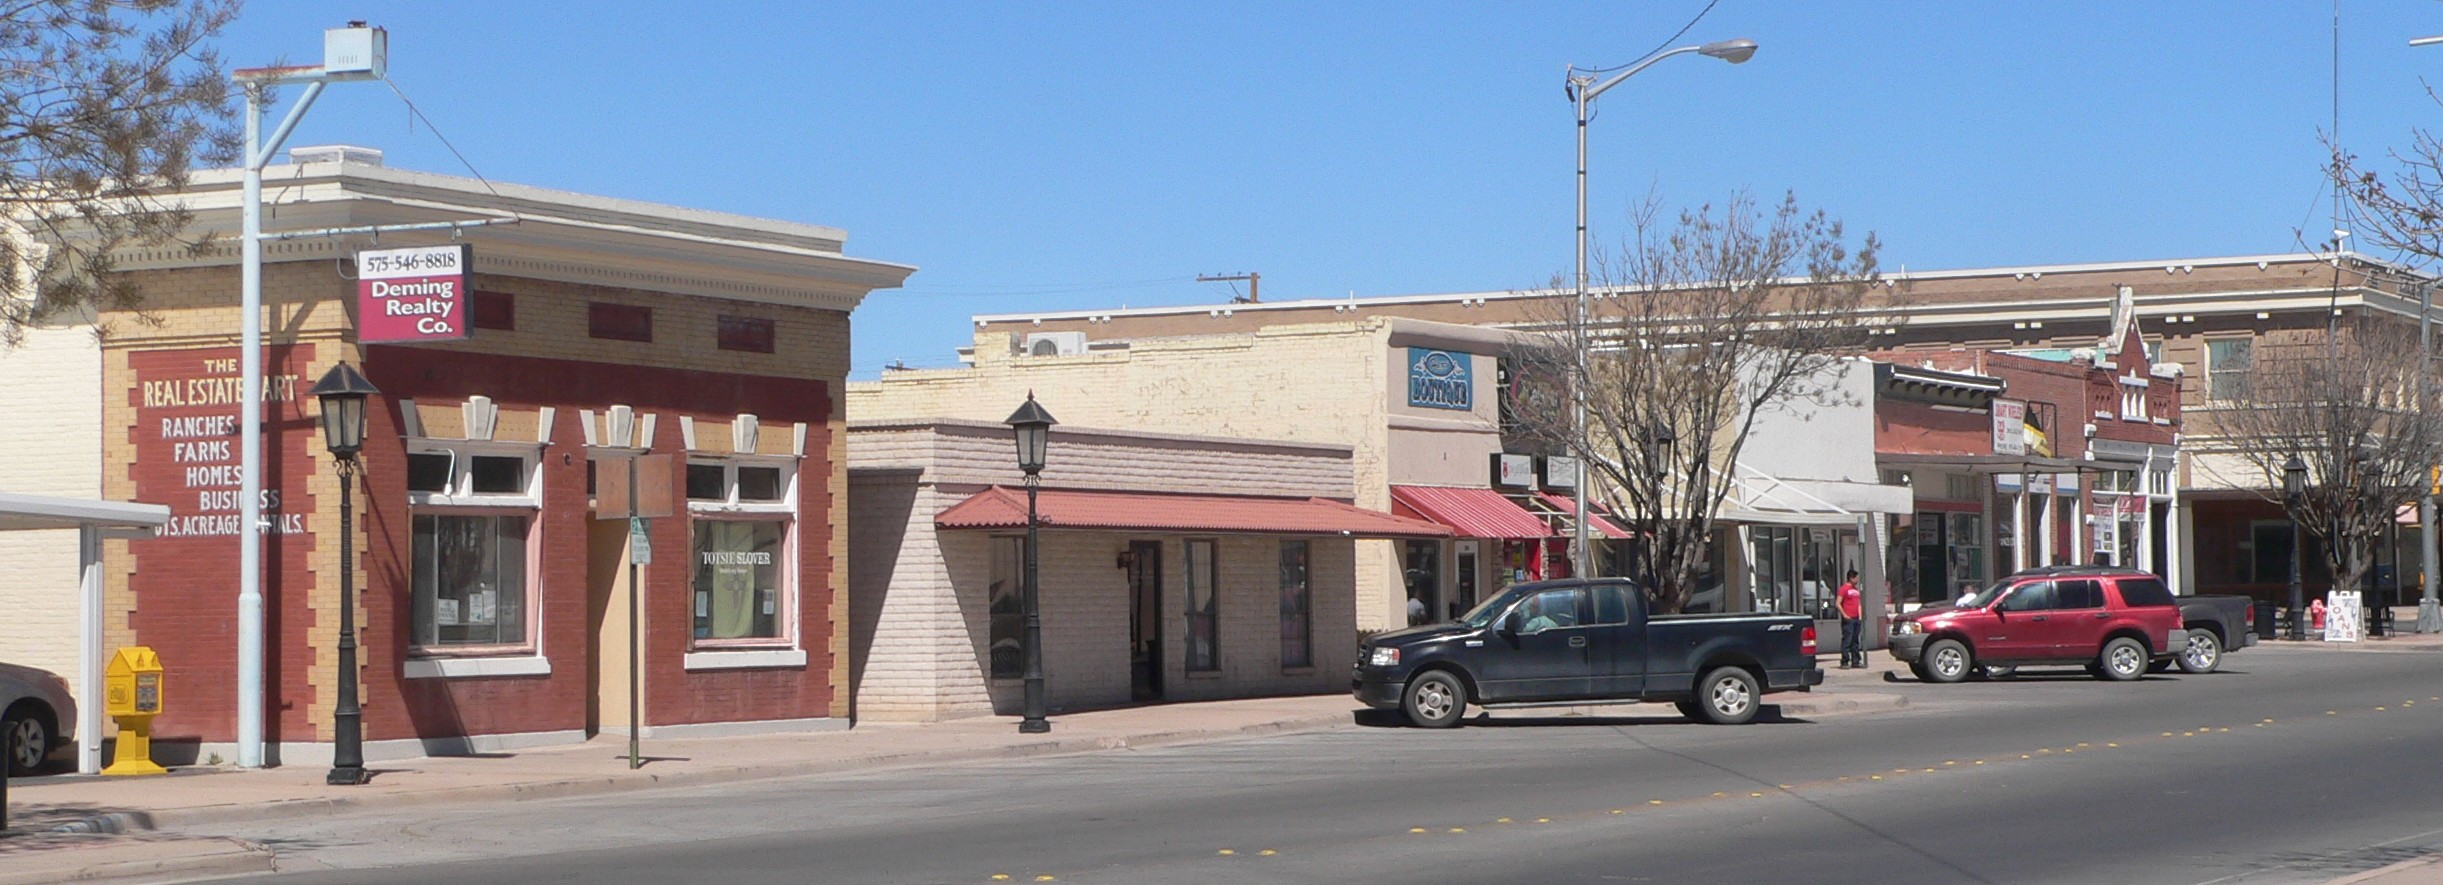 Best Restaurants In Albuquerque Nm